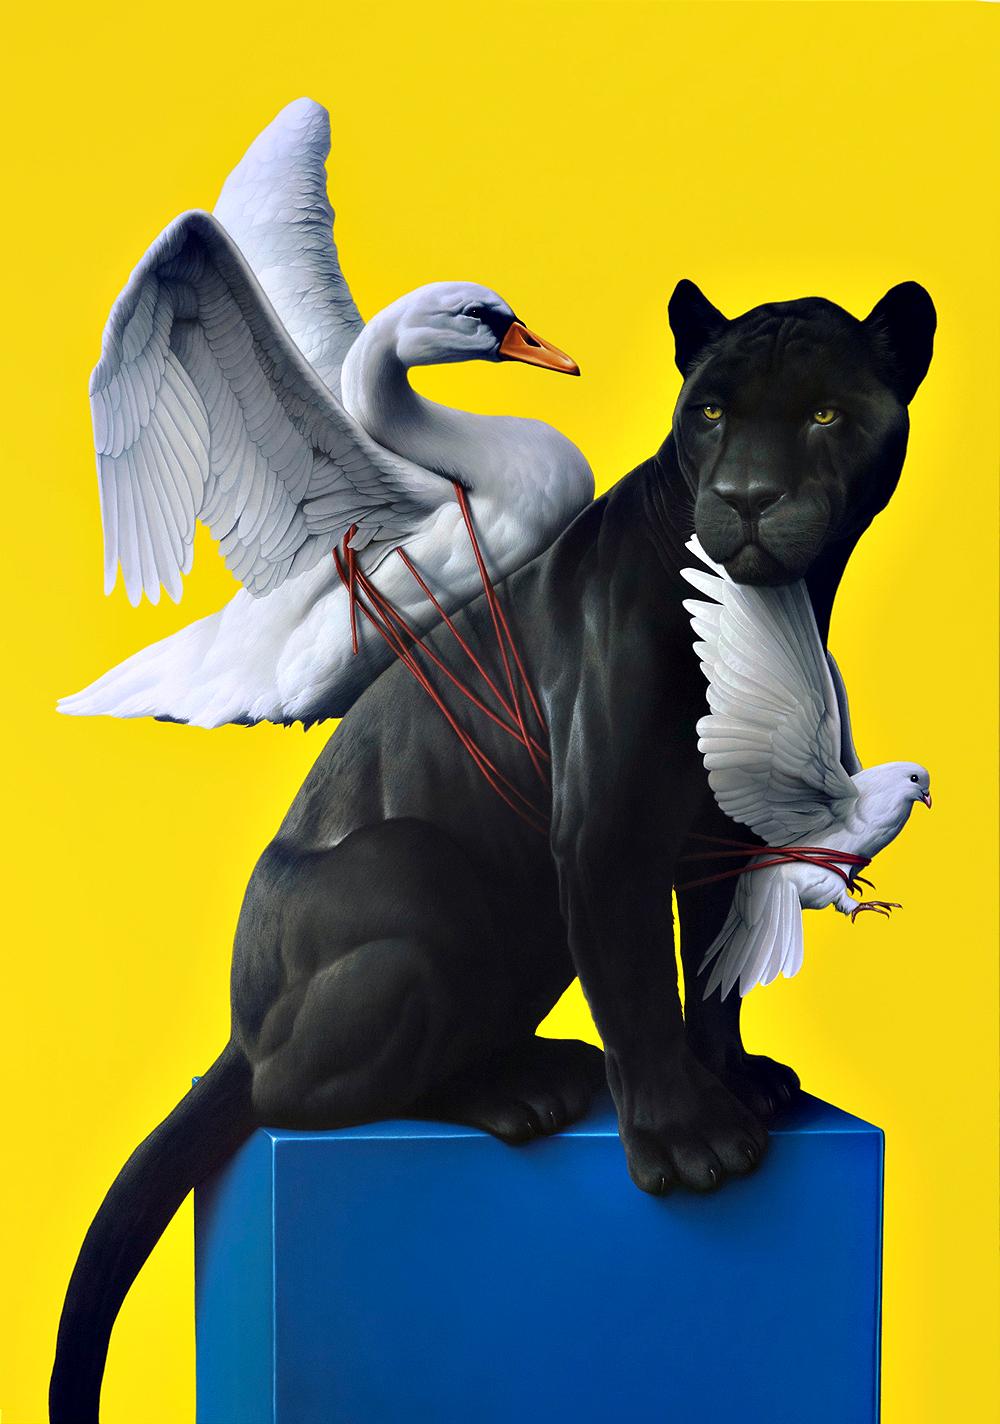 SERENITY (2012) Acryl auf Leinwand, 200 x 140 cm. (Courtesy of Eckhart Hahn.)